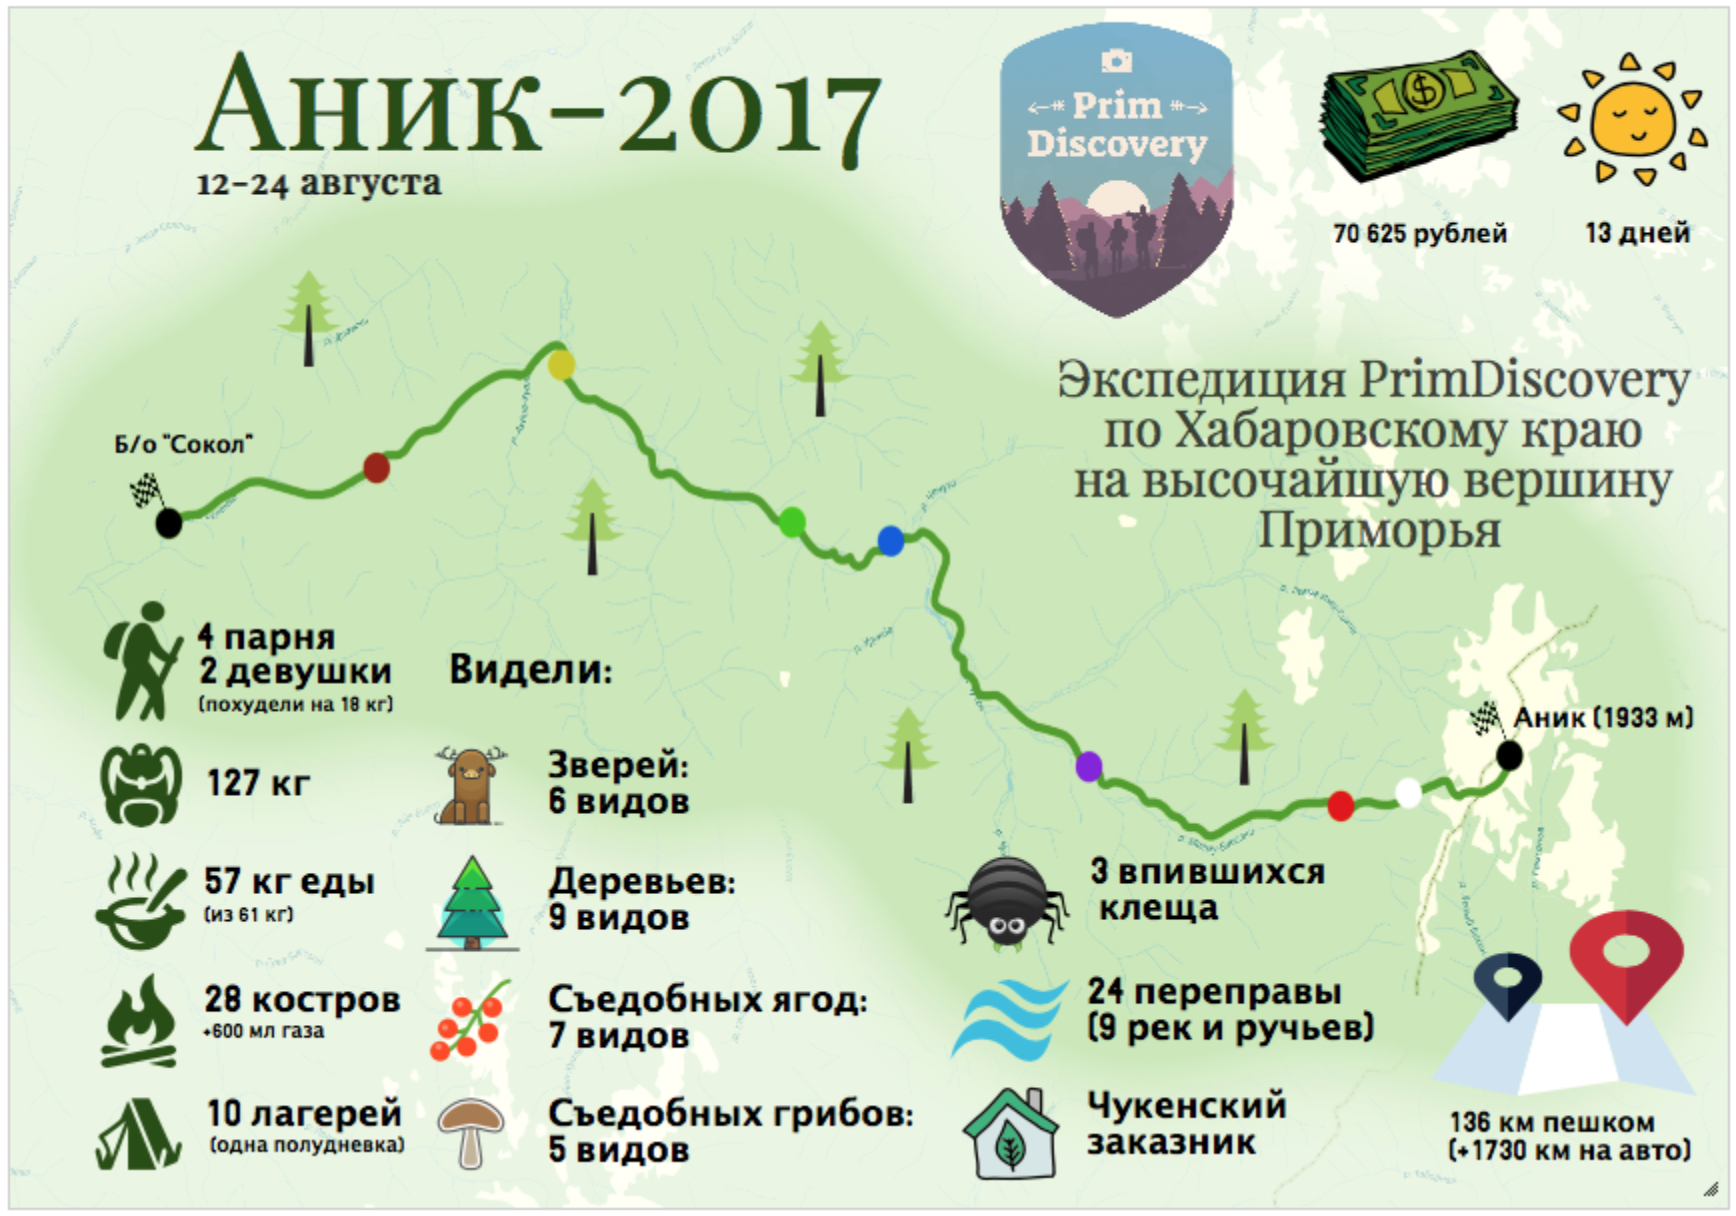 Экспедиция PrimDiscovery «Аник-2017». Фото предоставлено PrimDiscovery